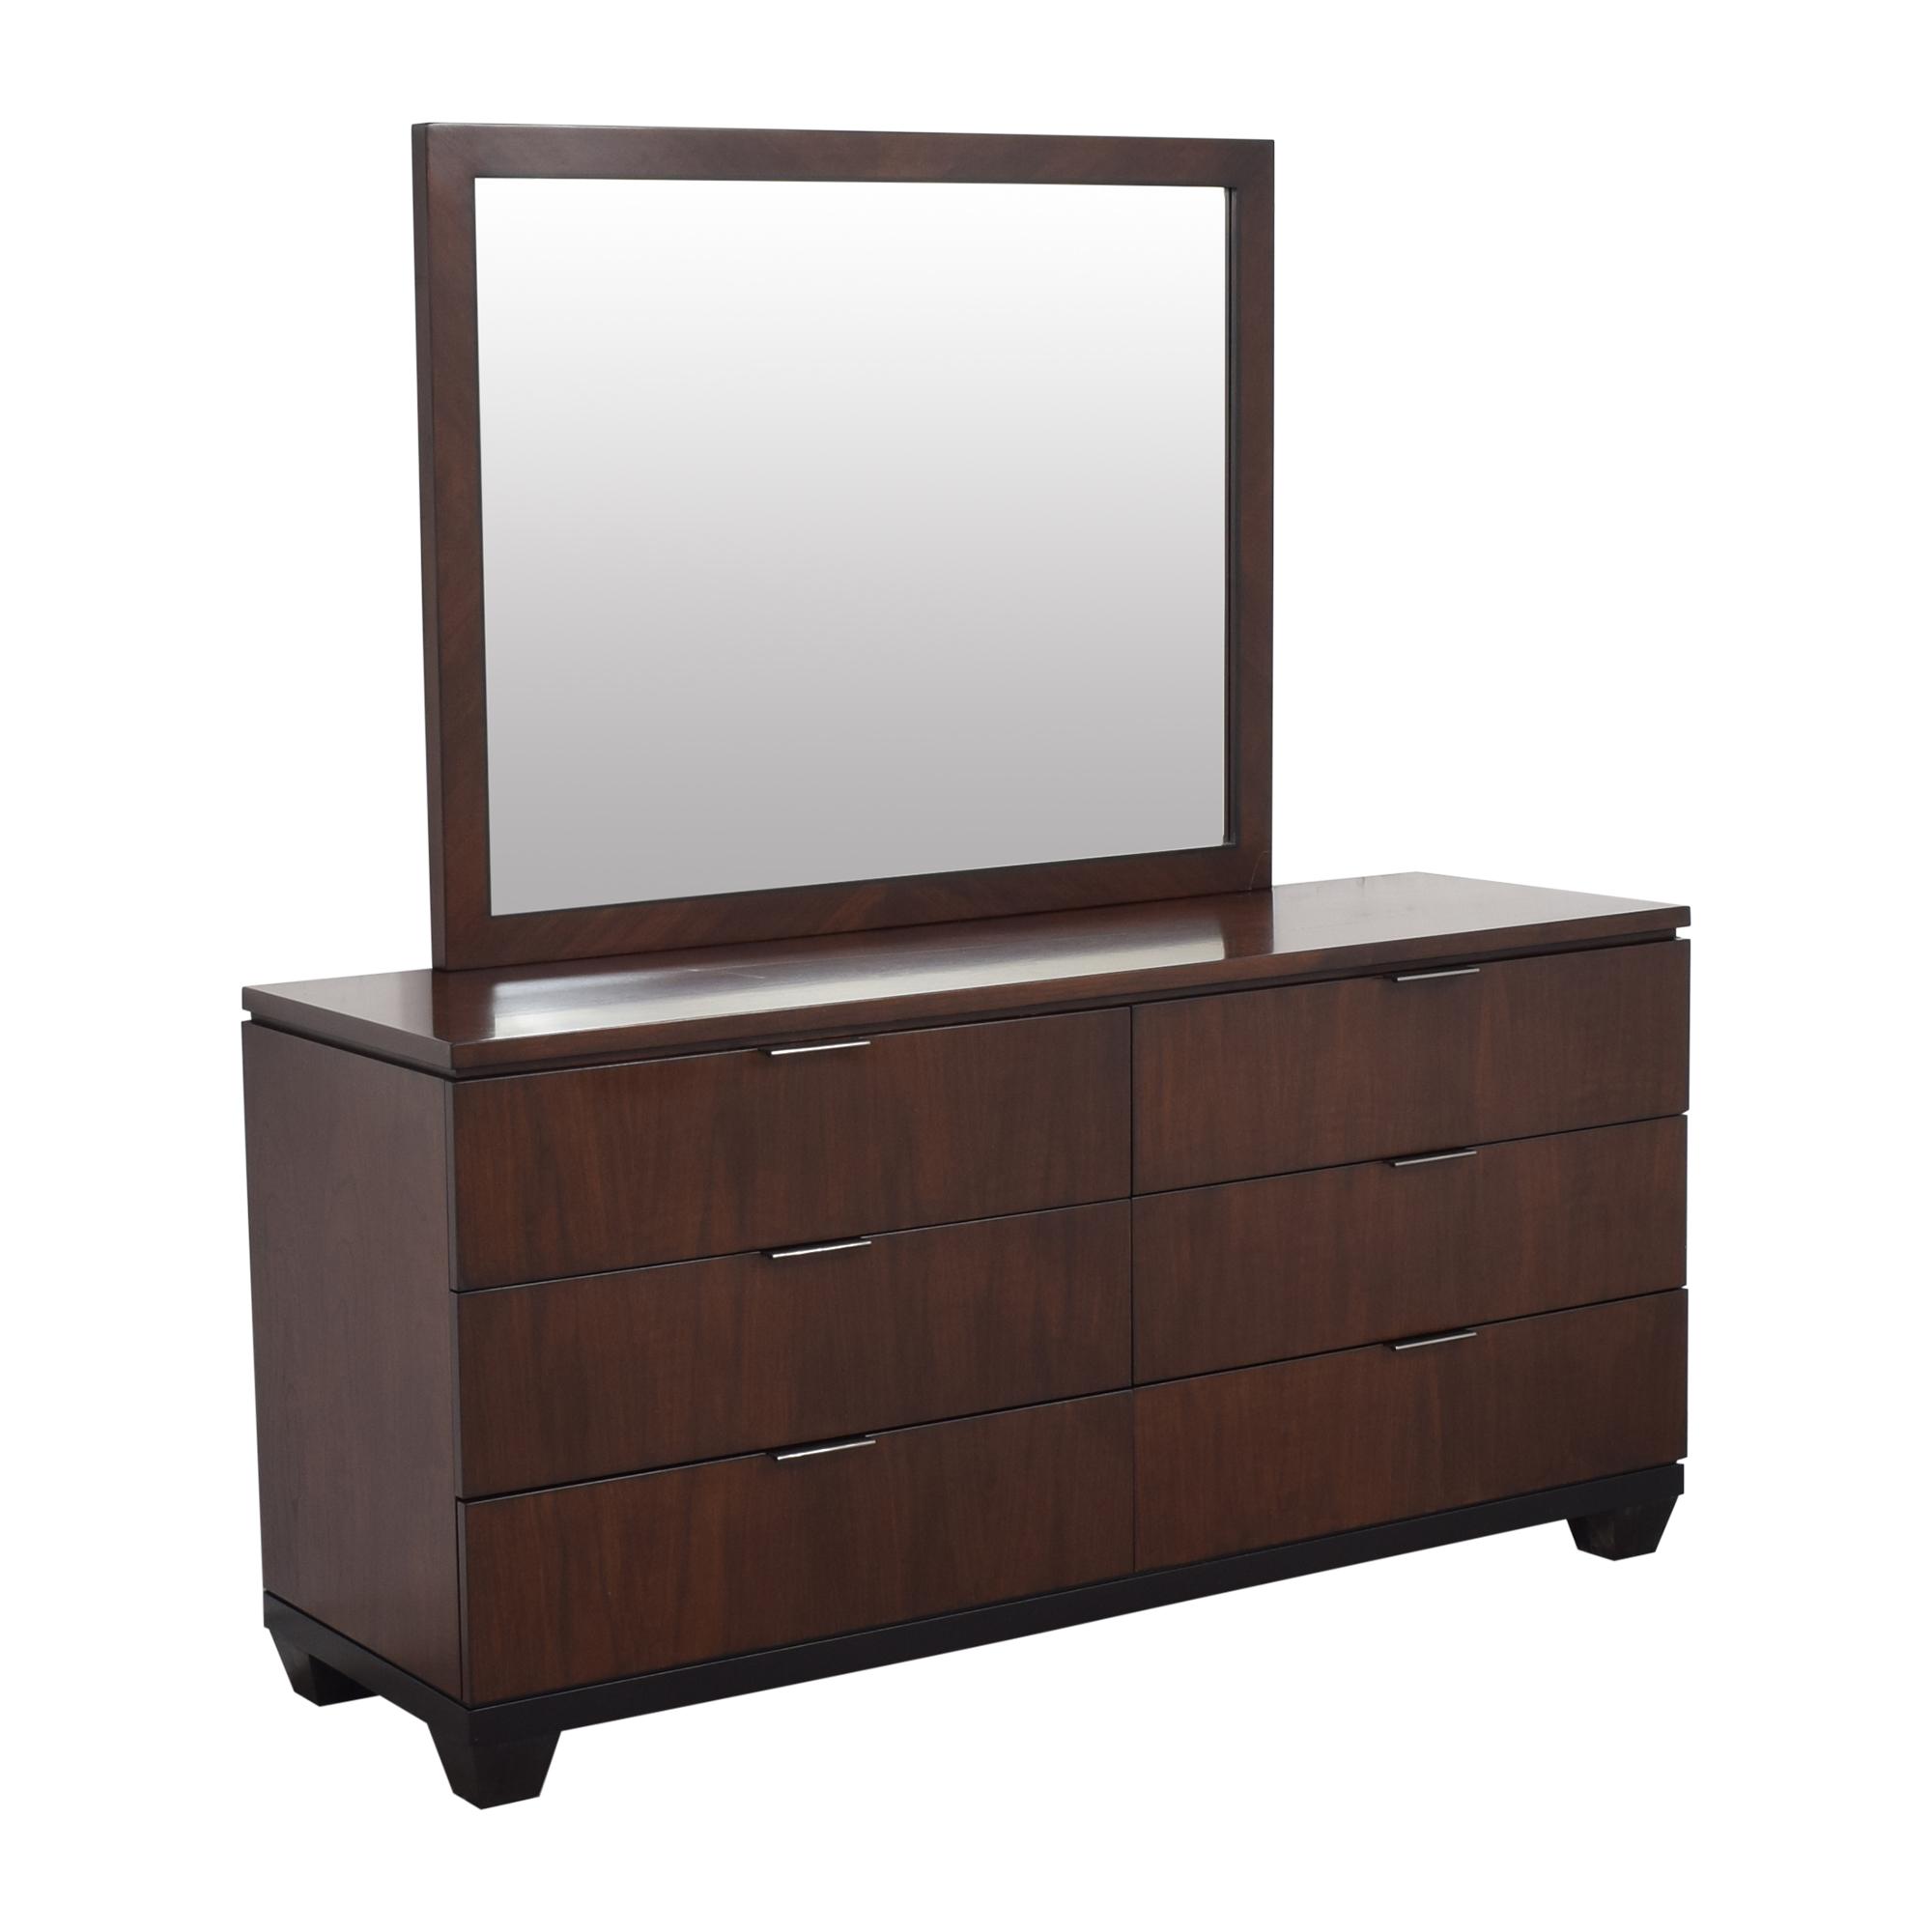 Macy's Double Dresser and Mirror Macy's